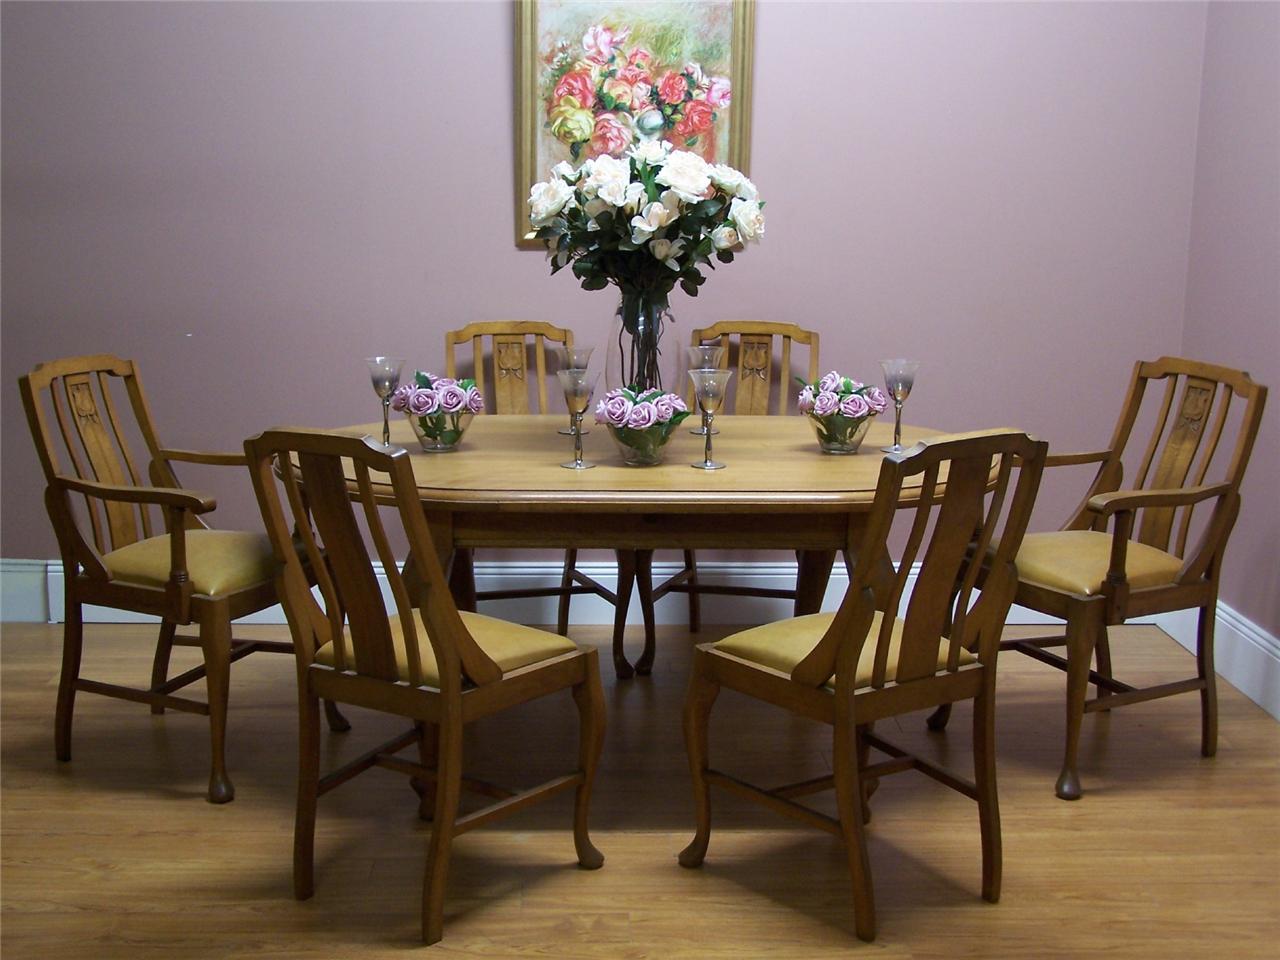 Antique Vintage Australian Maple Dining Kitchen Table  : 696516024o from www.ebay.com.au size 1280 x 960 jpeg 123kB